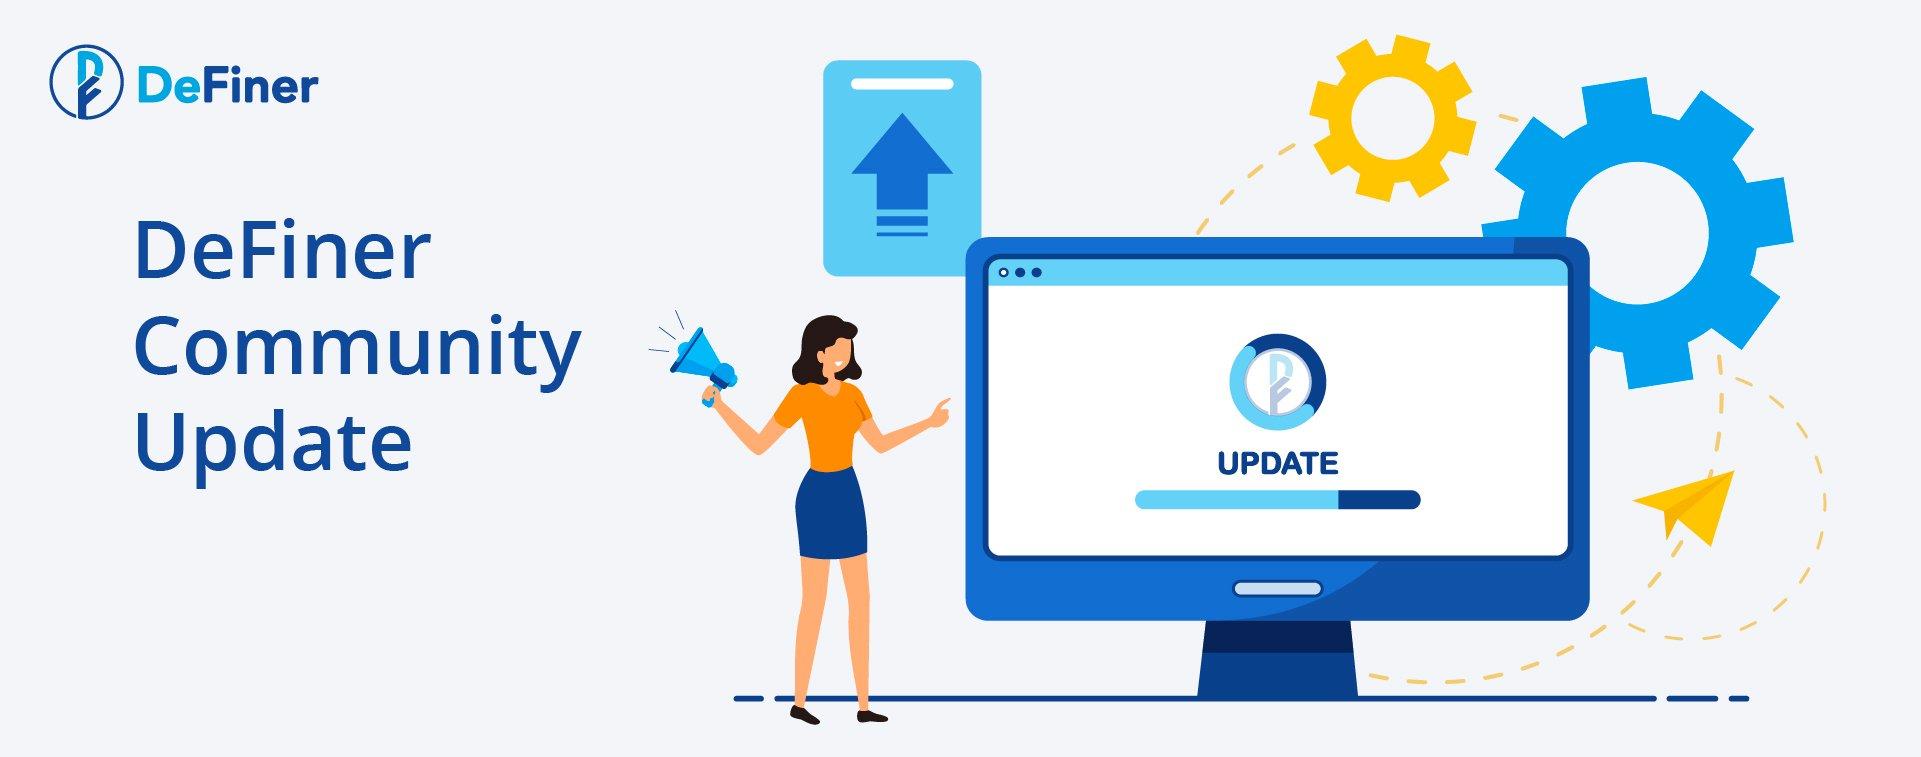 DeFiner Community Update 1_blog-jpg